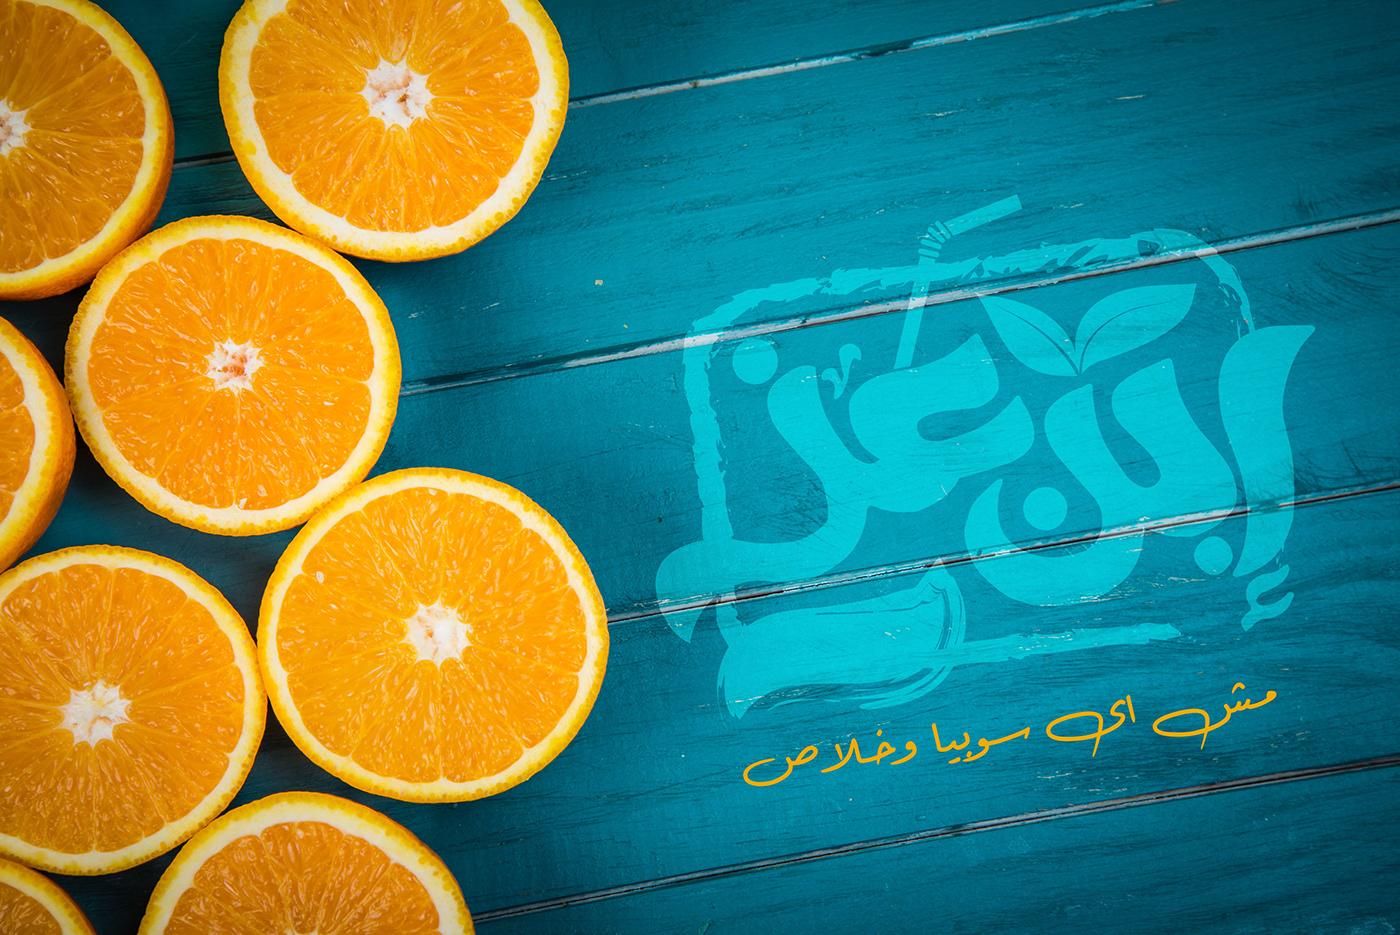 Image may contain: lemon, fruit and grapefruit